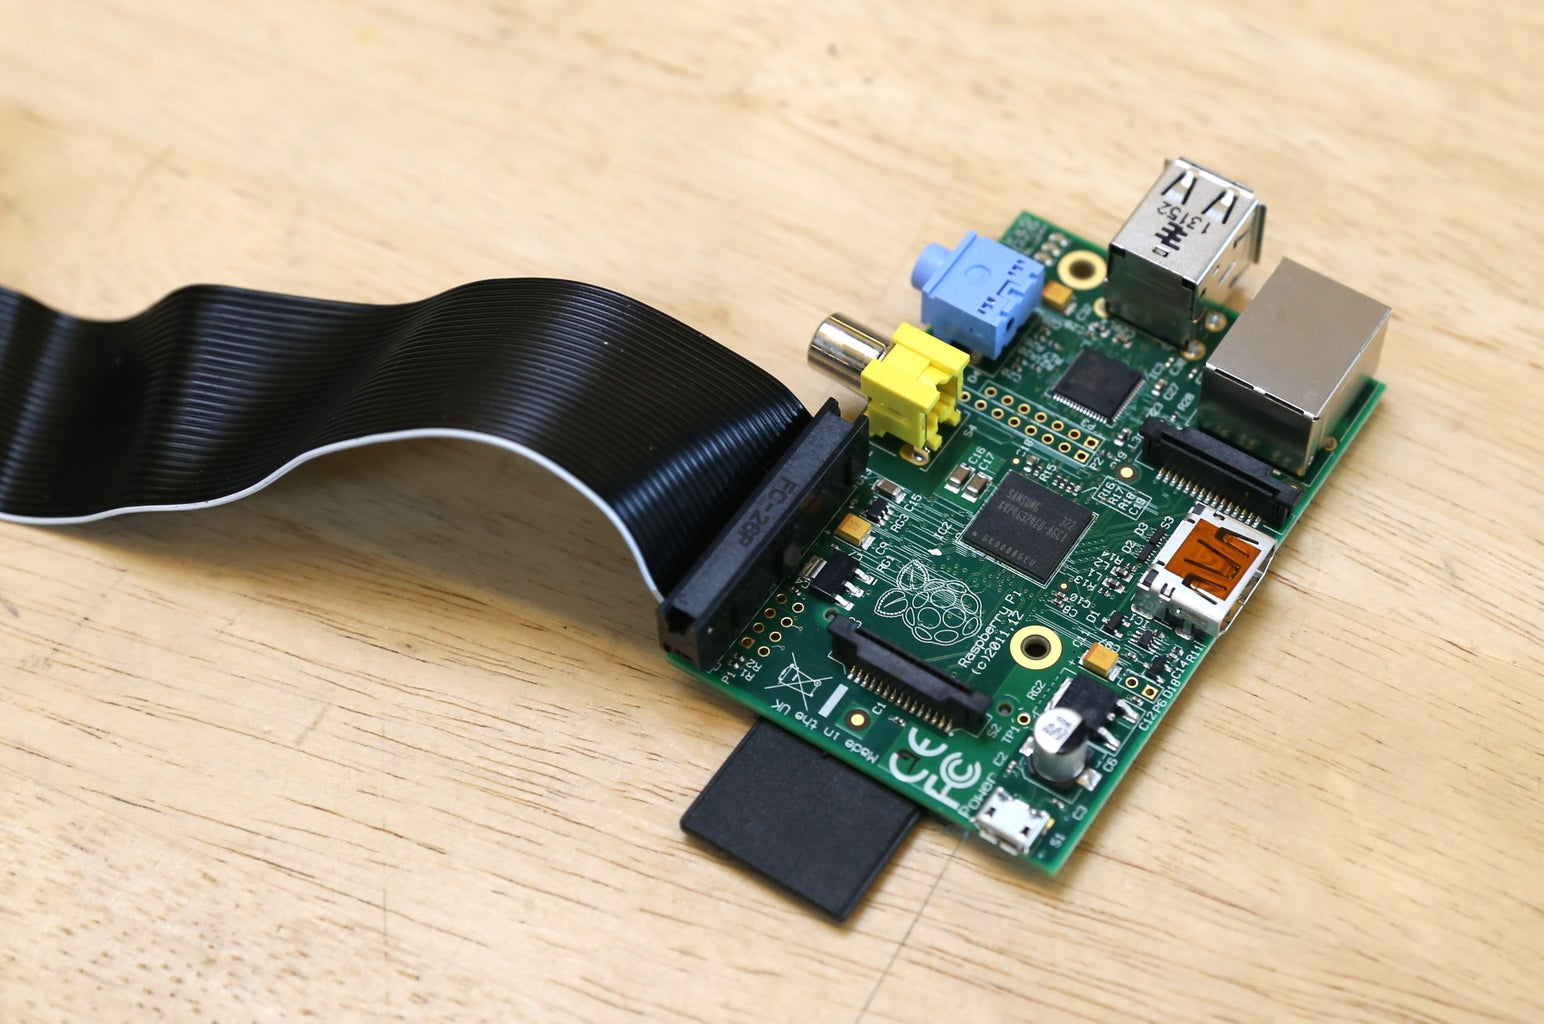 Scale Circuitry: MC3008 ADC Convertor